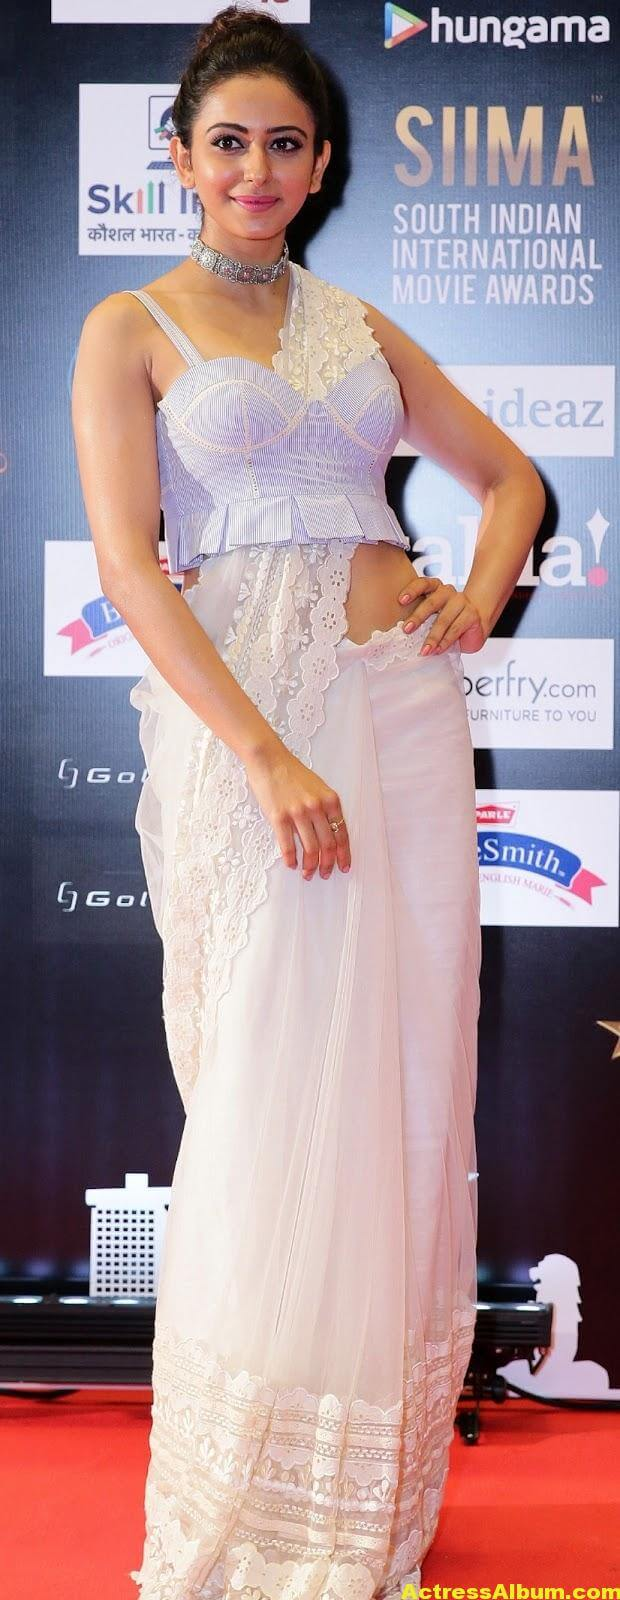 Rakul Preet Photos In White Dress